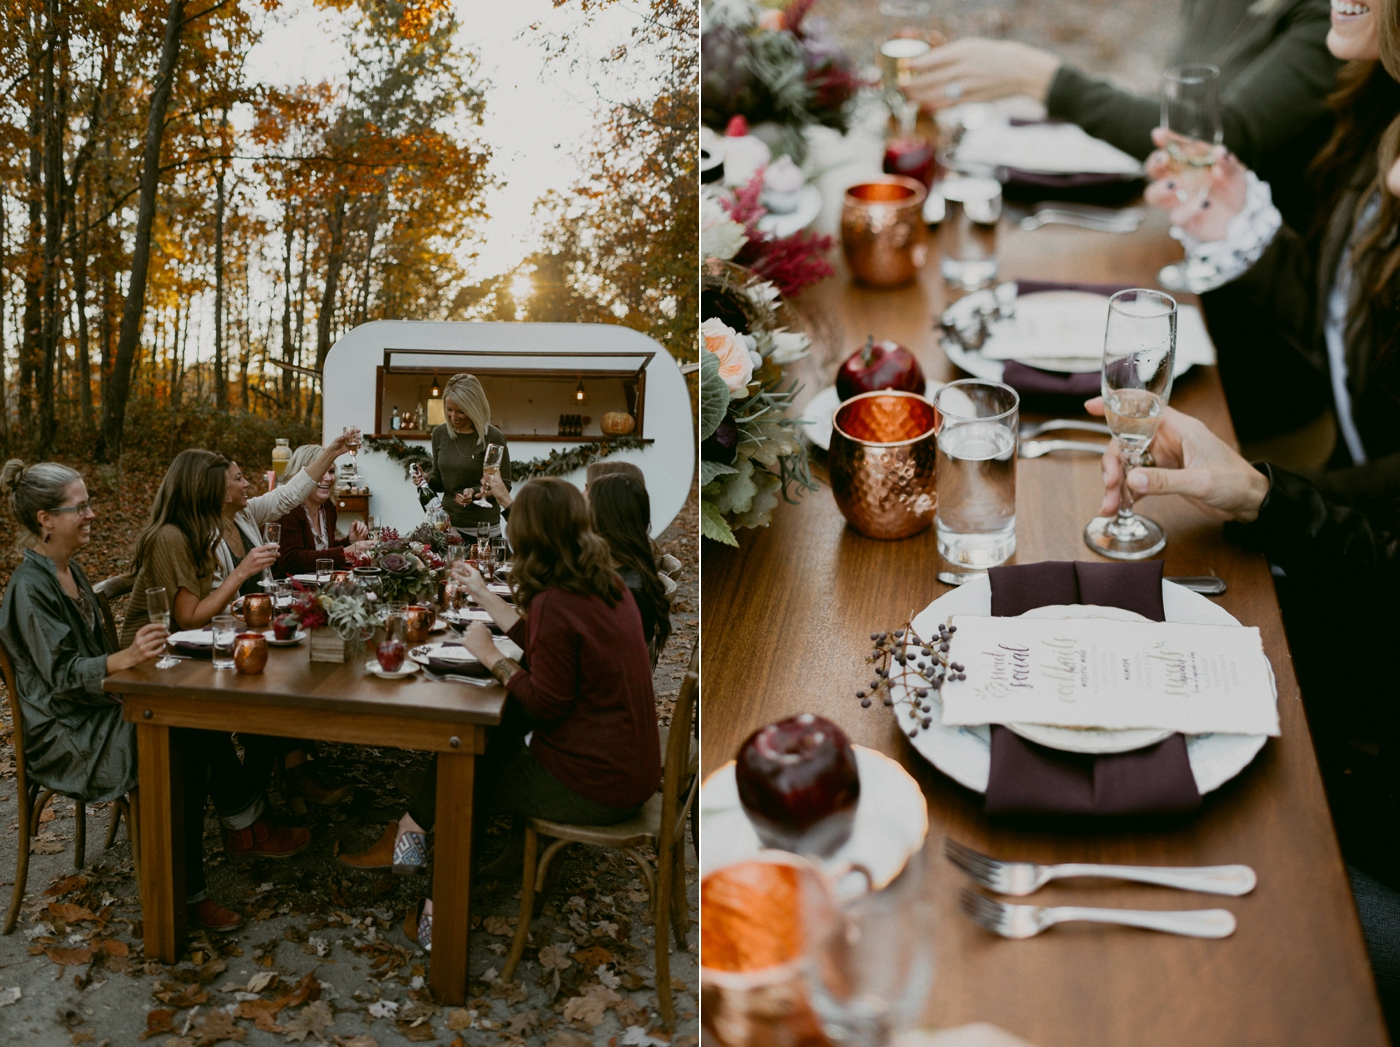 Autumn-Bridal-Shower-Vintage-Caravan-Styled-Shoot_MJPHOTO-91.jpg